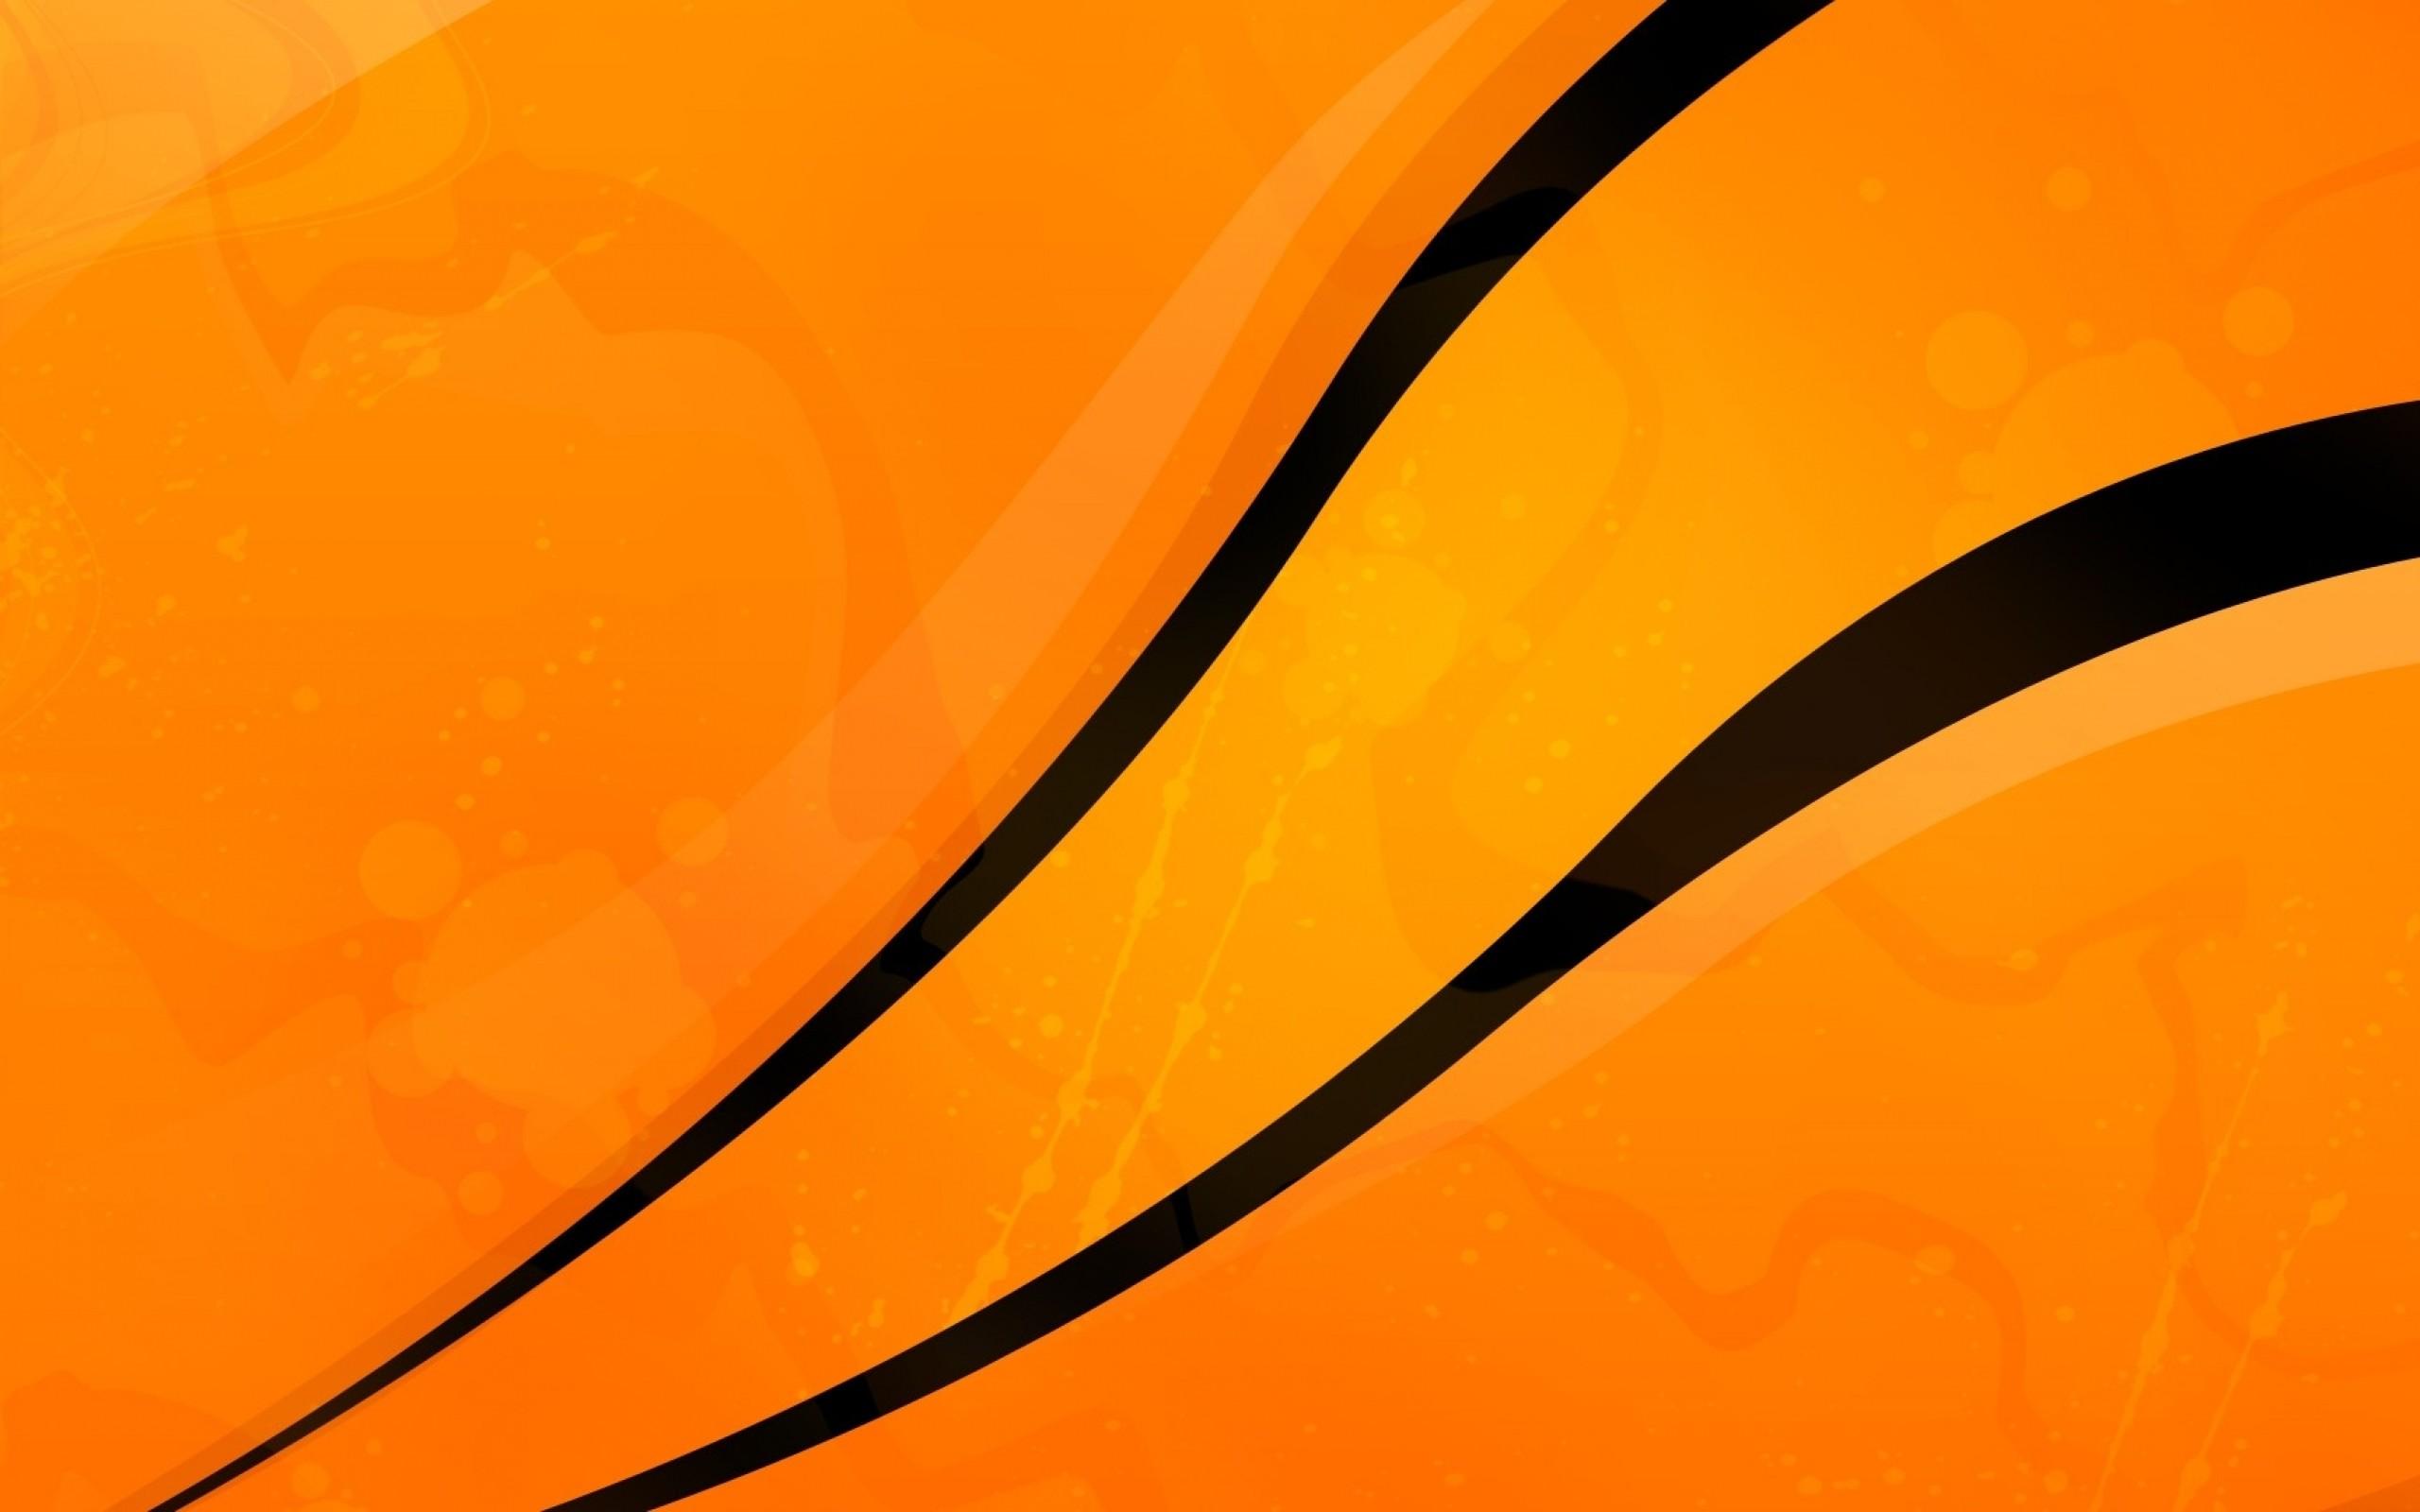 Abstract Orange Wallpaper 48551